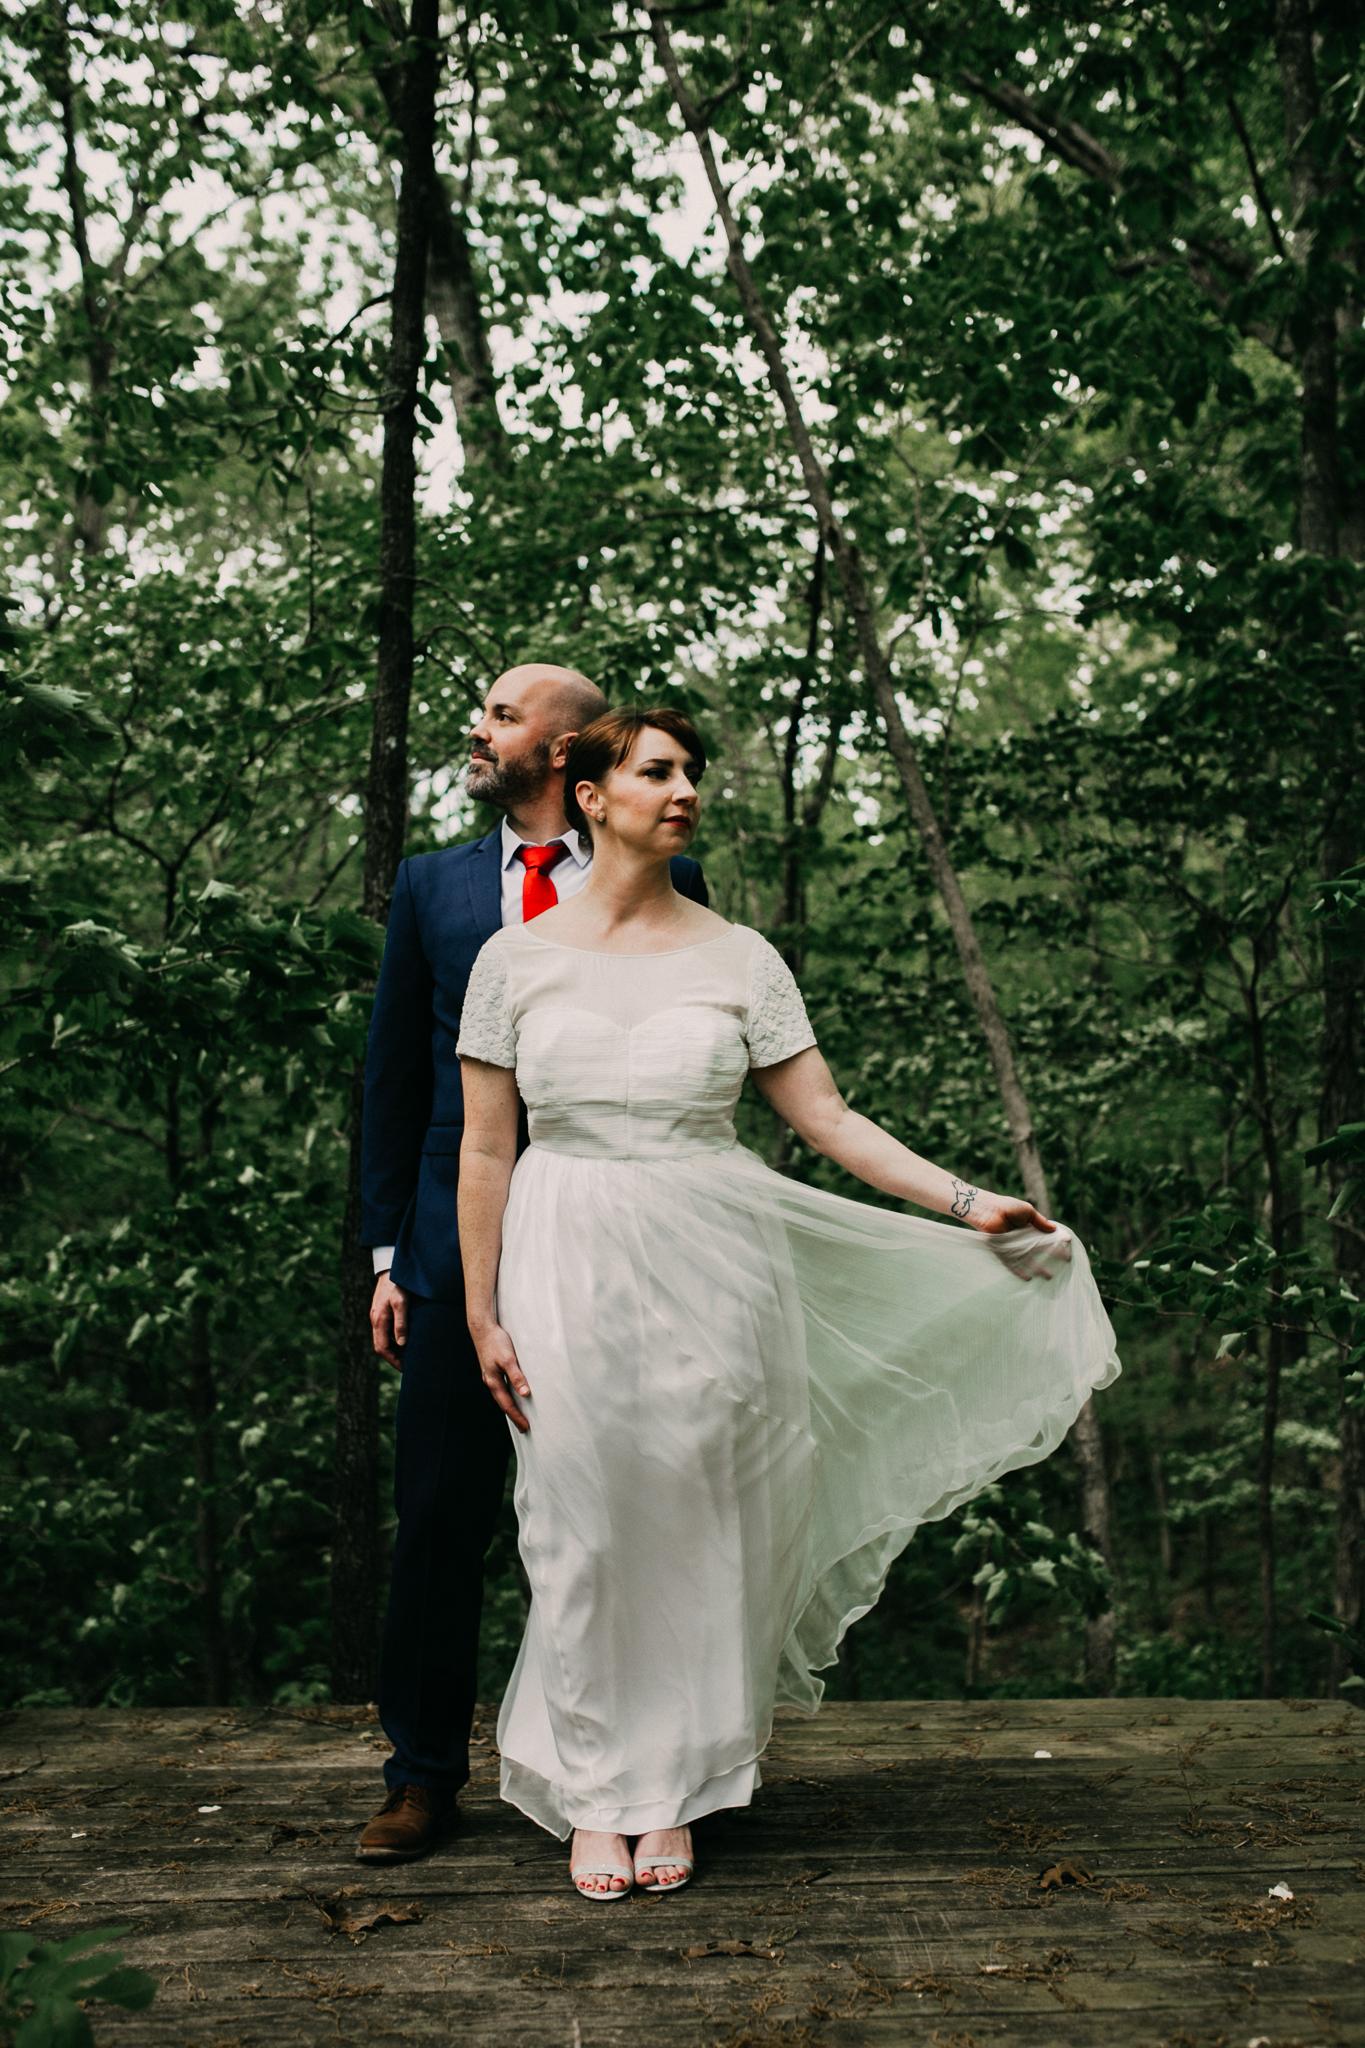 Midwest_Backyard_Wedding_MelaPhoto-0405.jpg